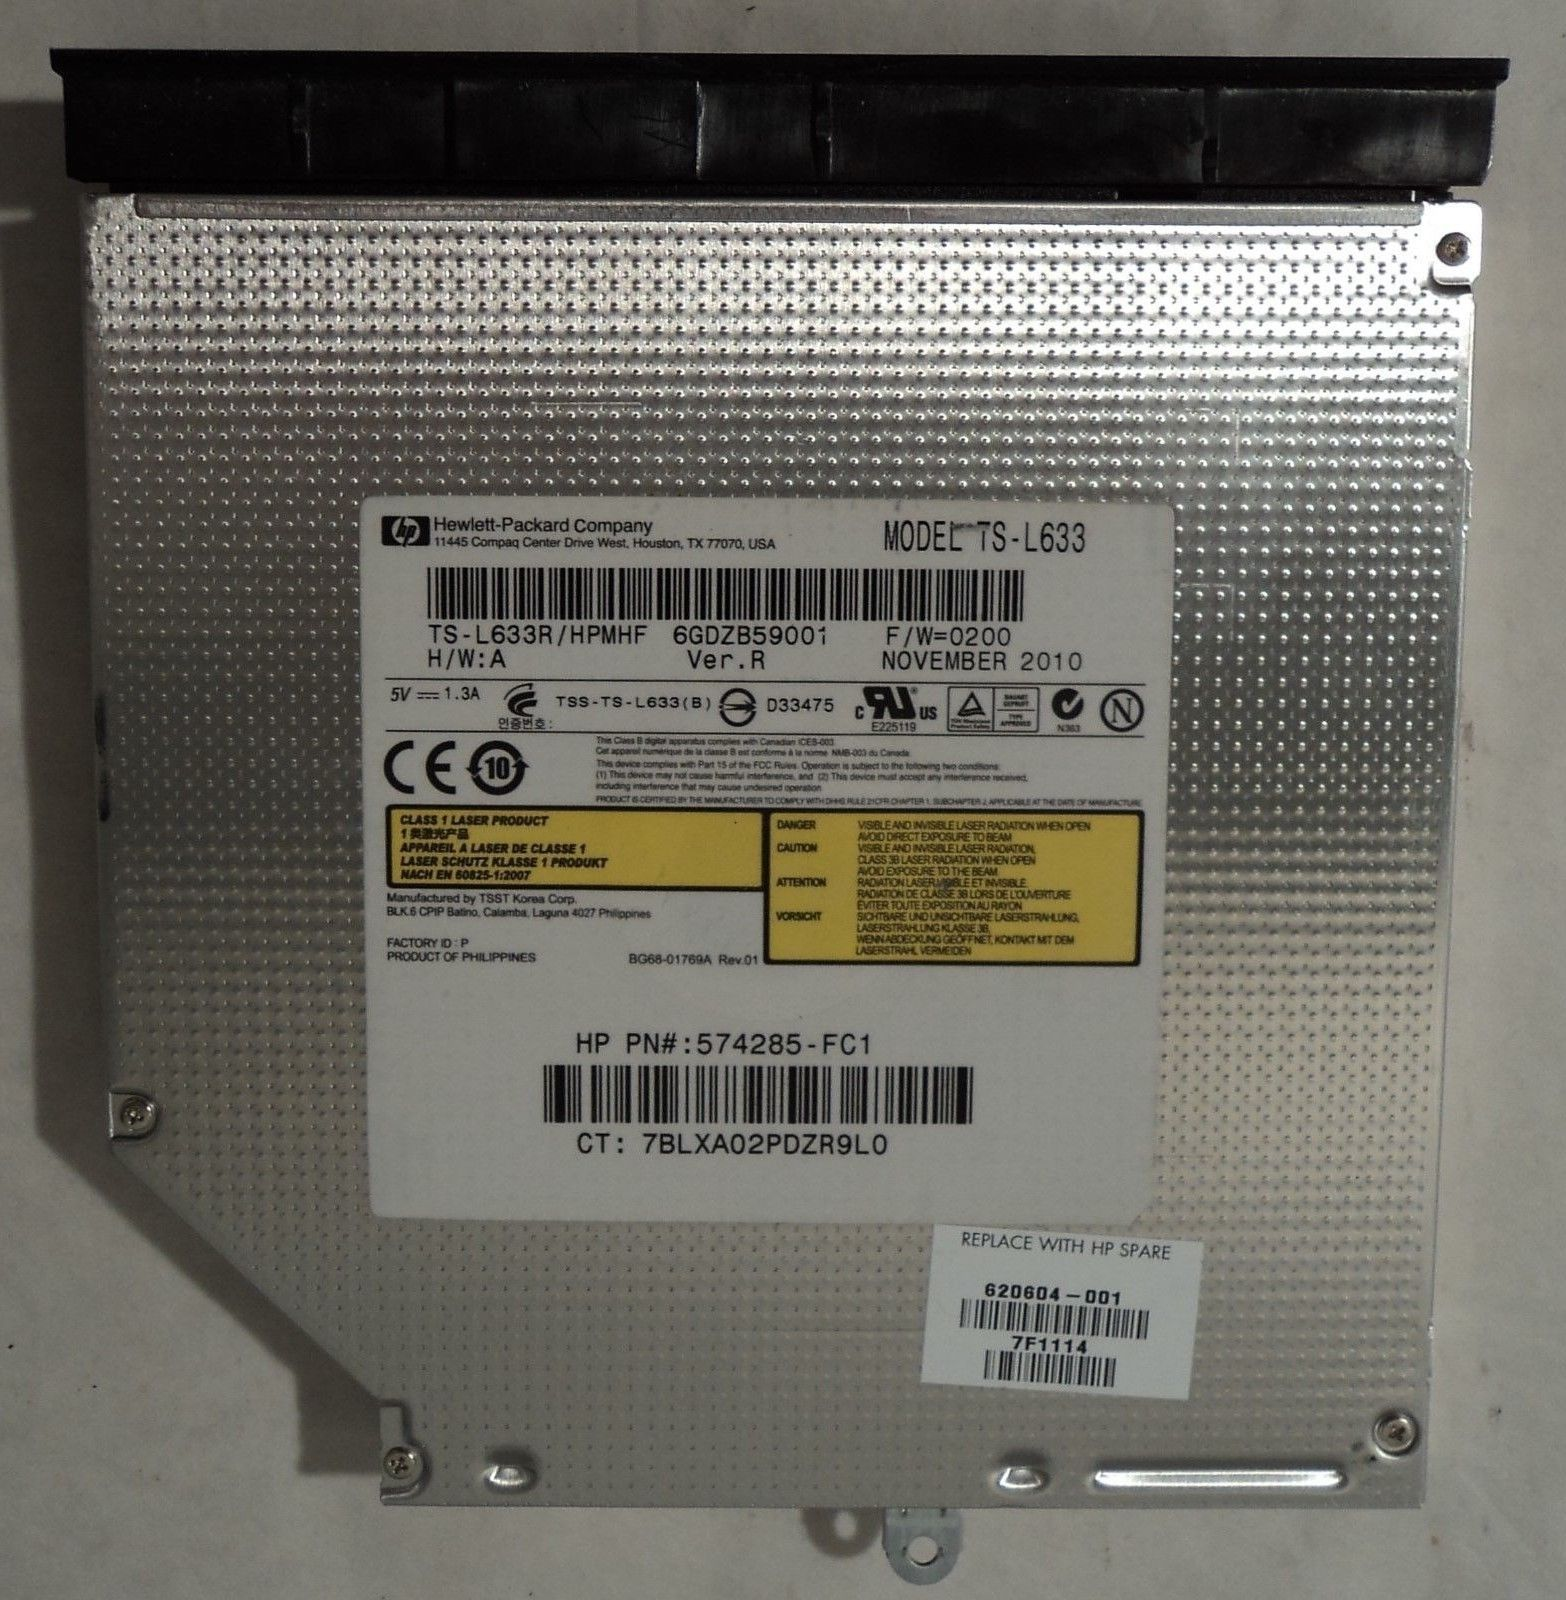 HP TS-L633R/HPMHF (574285-FC1) (600651-001) and 50 similar items